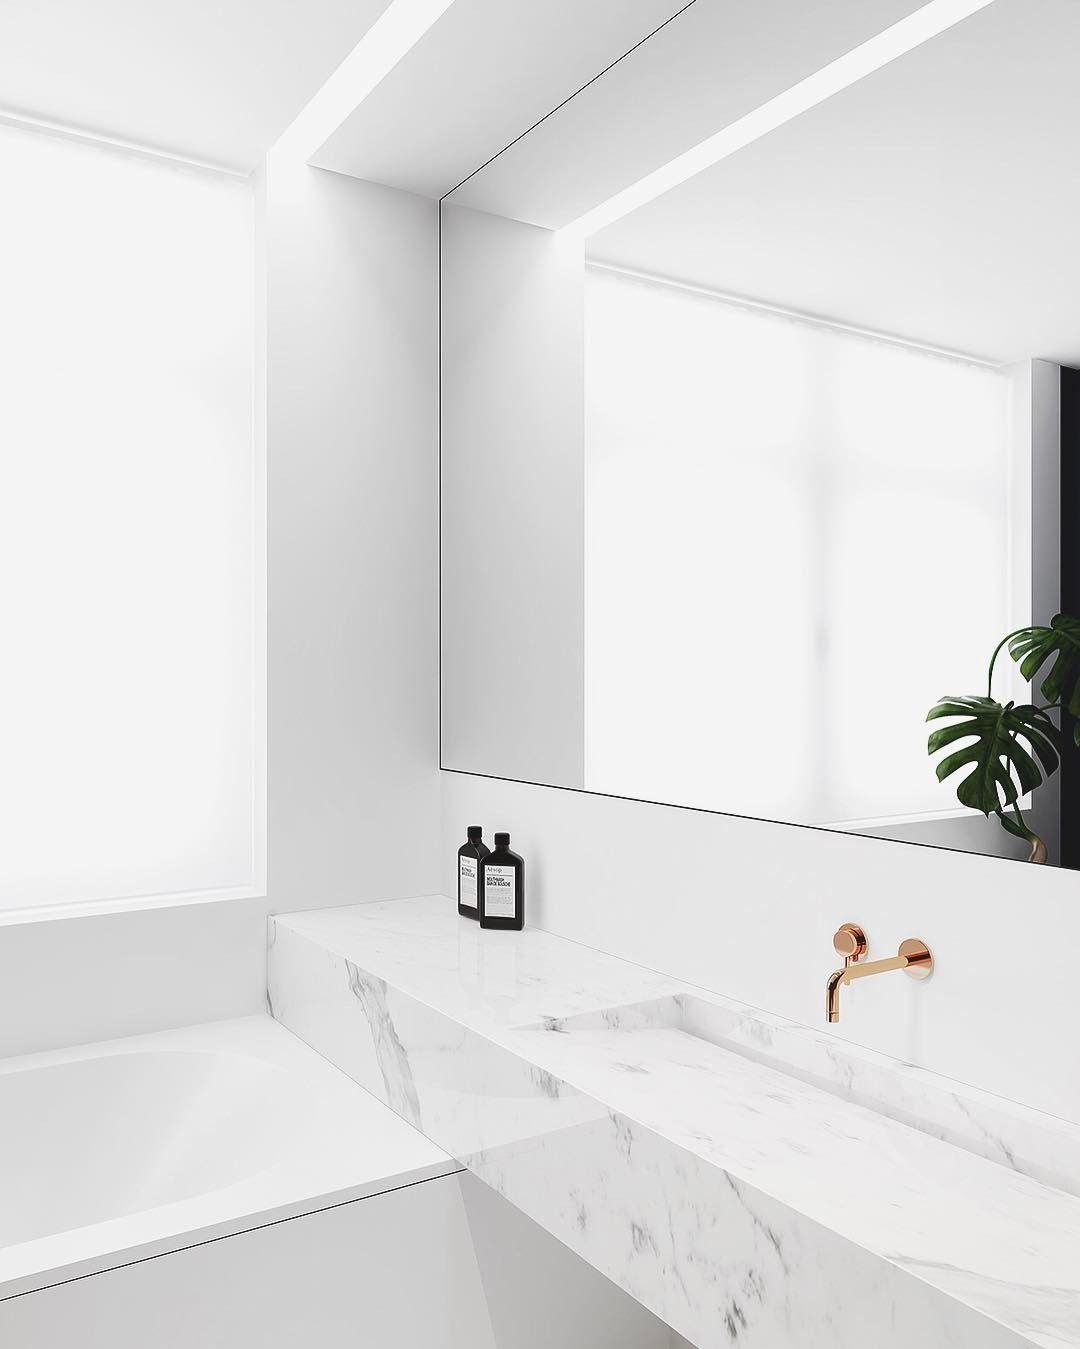 Badezimmer design gold pin by anneleen vranken on huisje  pinterest  interiors bathroom